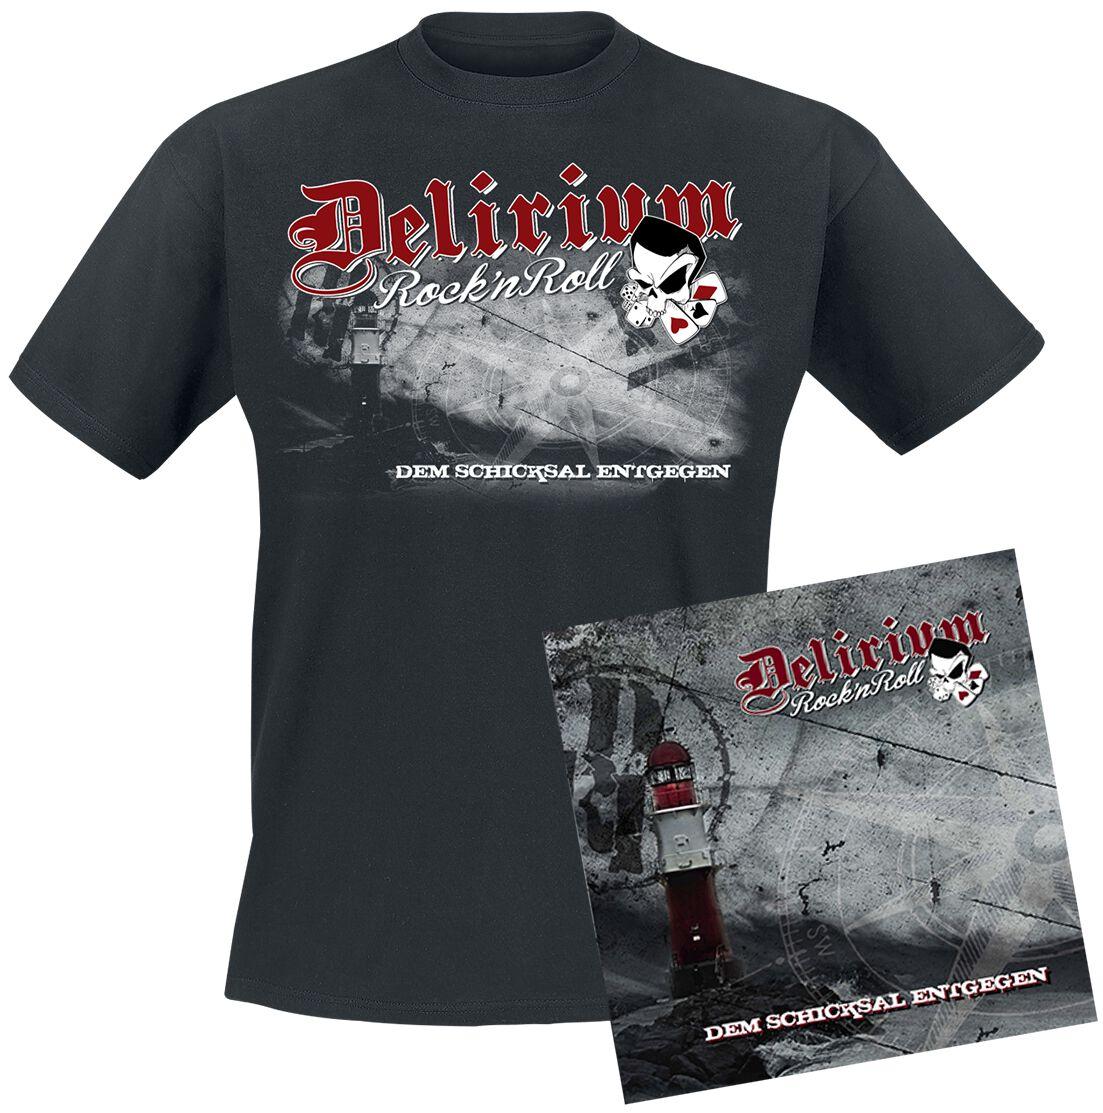 Image of   Delirium Rock 'n' Roll Dem Schicksal entgegen CD & T-Shirt Standard